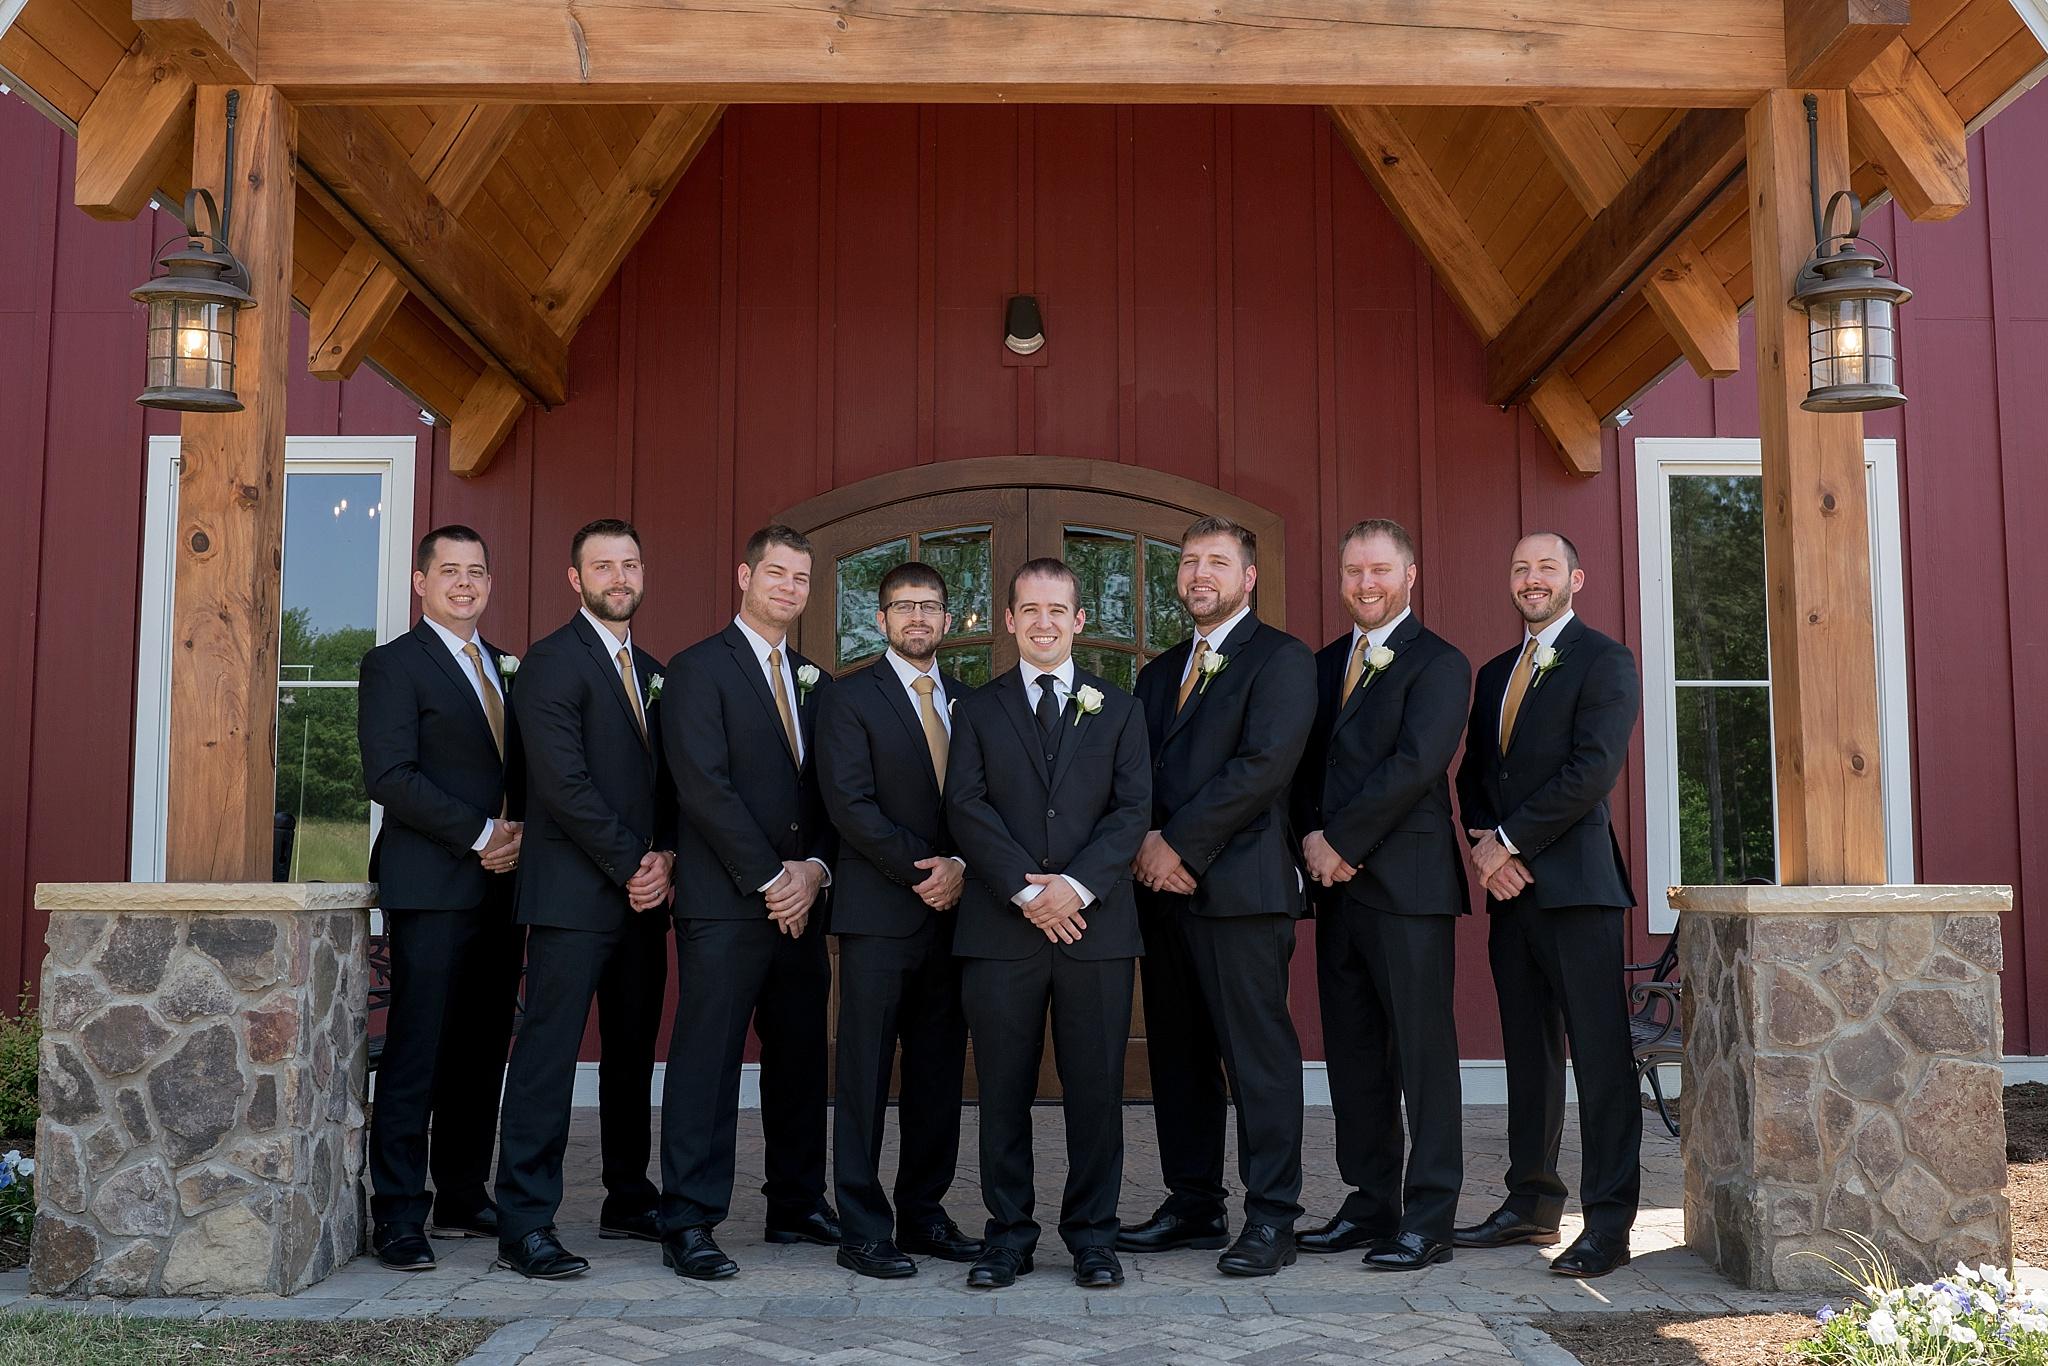 Pavilion-Carriage-Farms-Wedding-Photographer-205.jpg